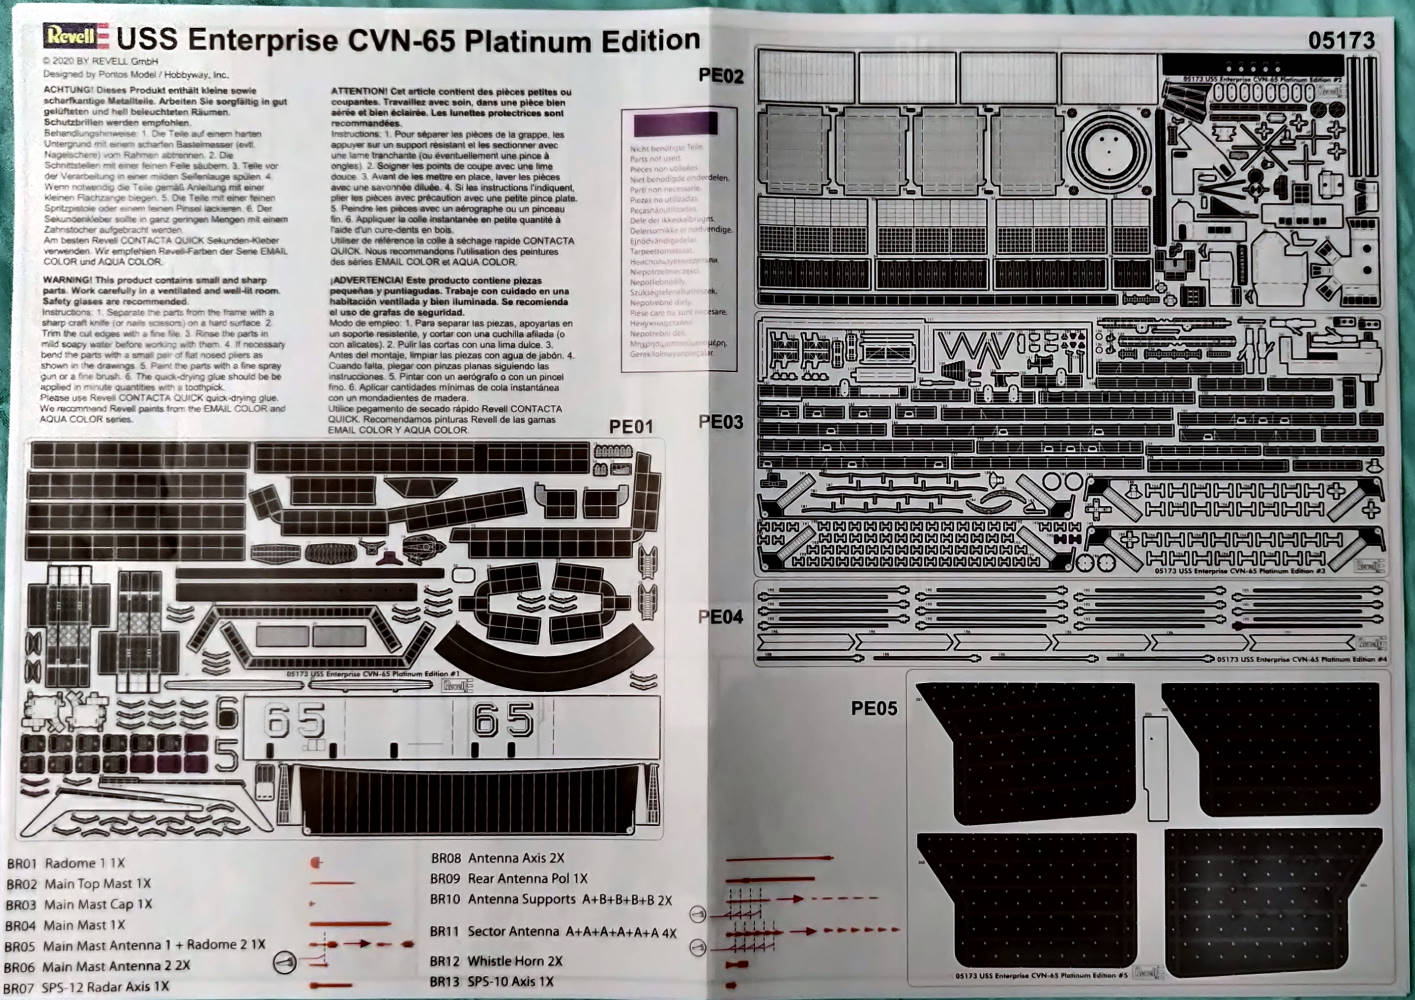 USS Enterprise (CVN-65) 1/400 PLATINUM Edition Cvan-665